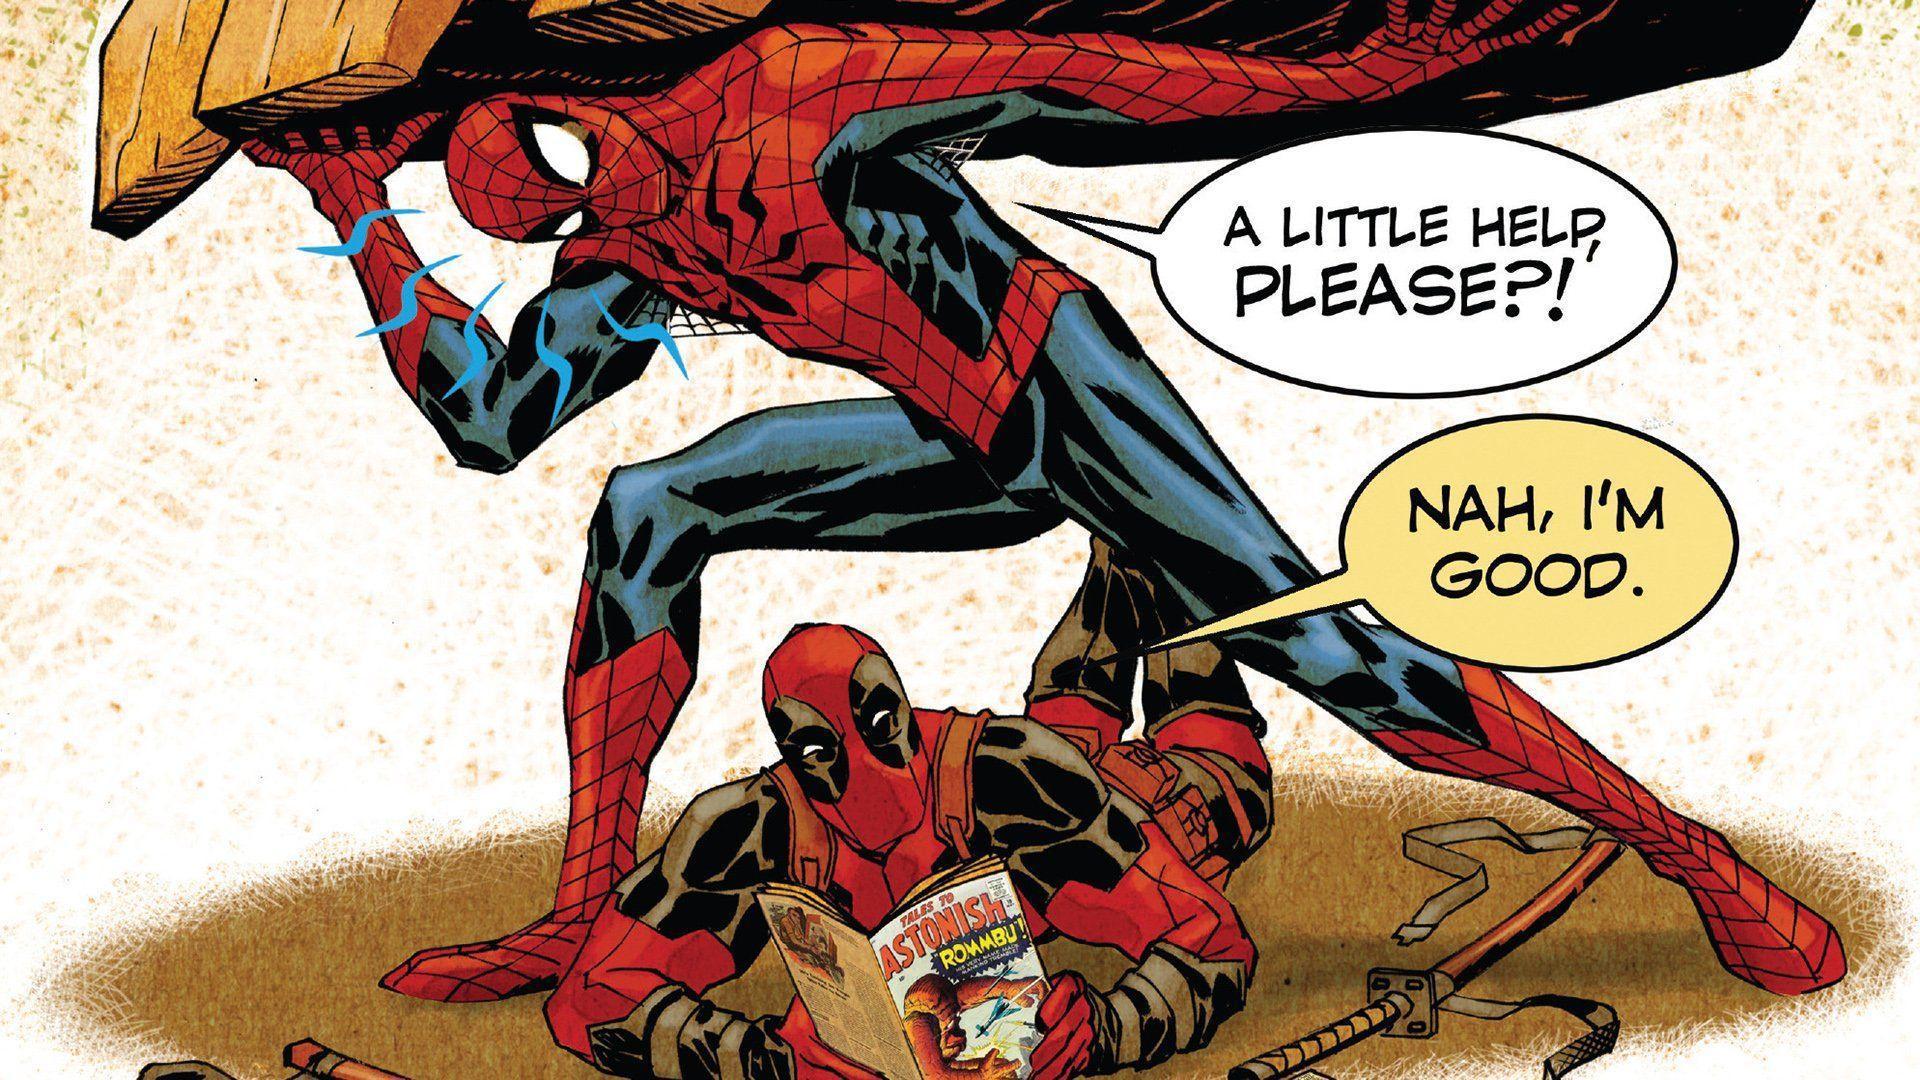 Spider Man Marvel Comics Deadpool Wallpapers Top Free Spider Man